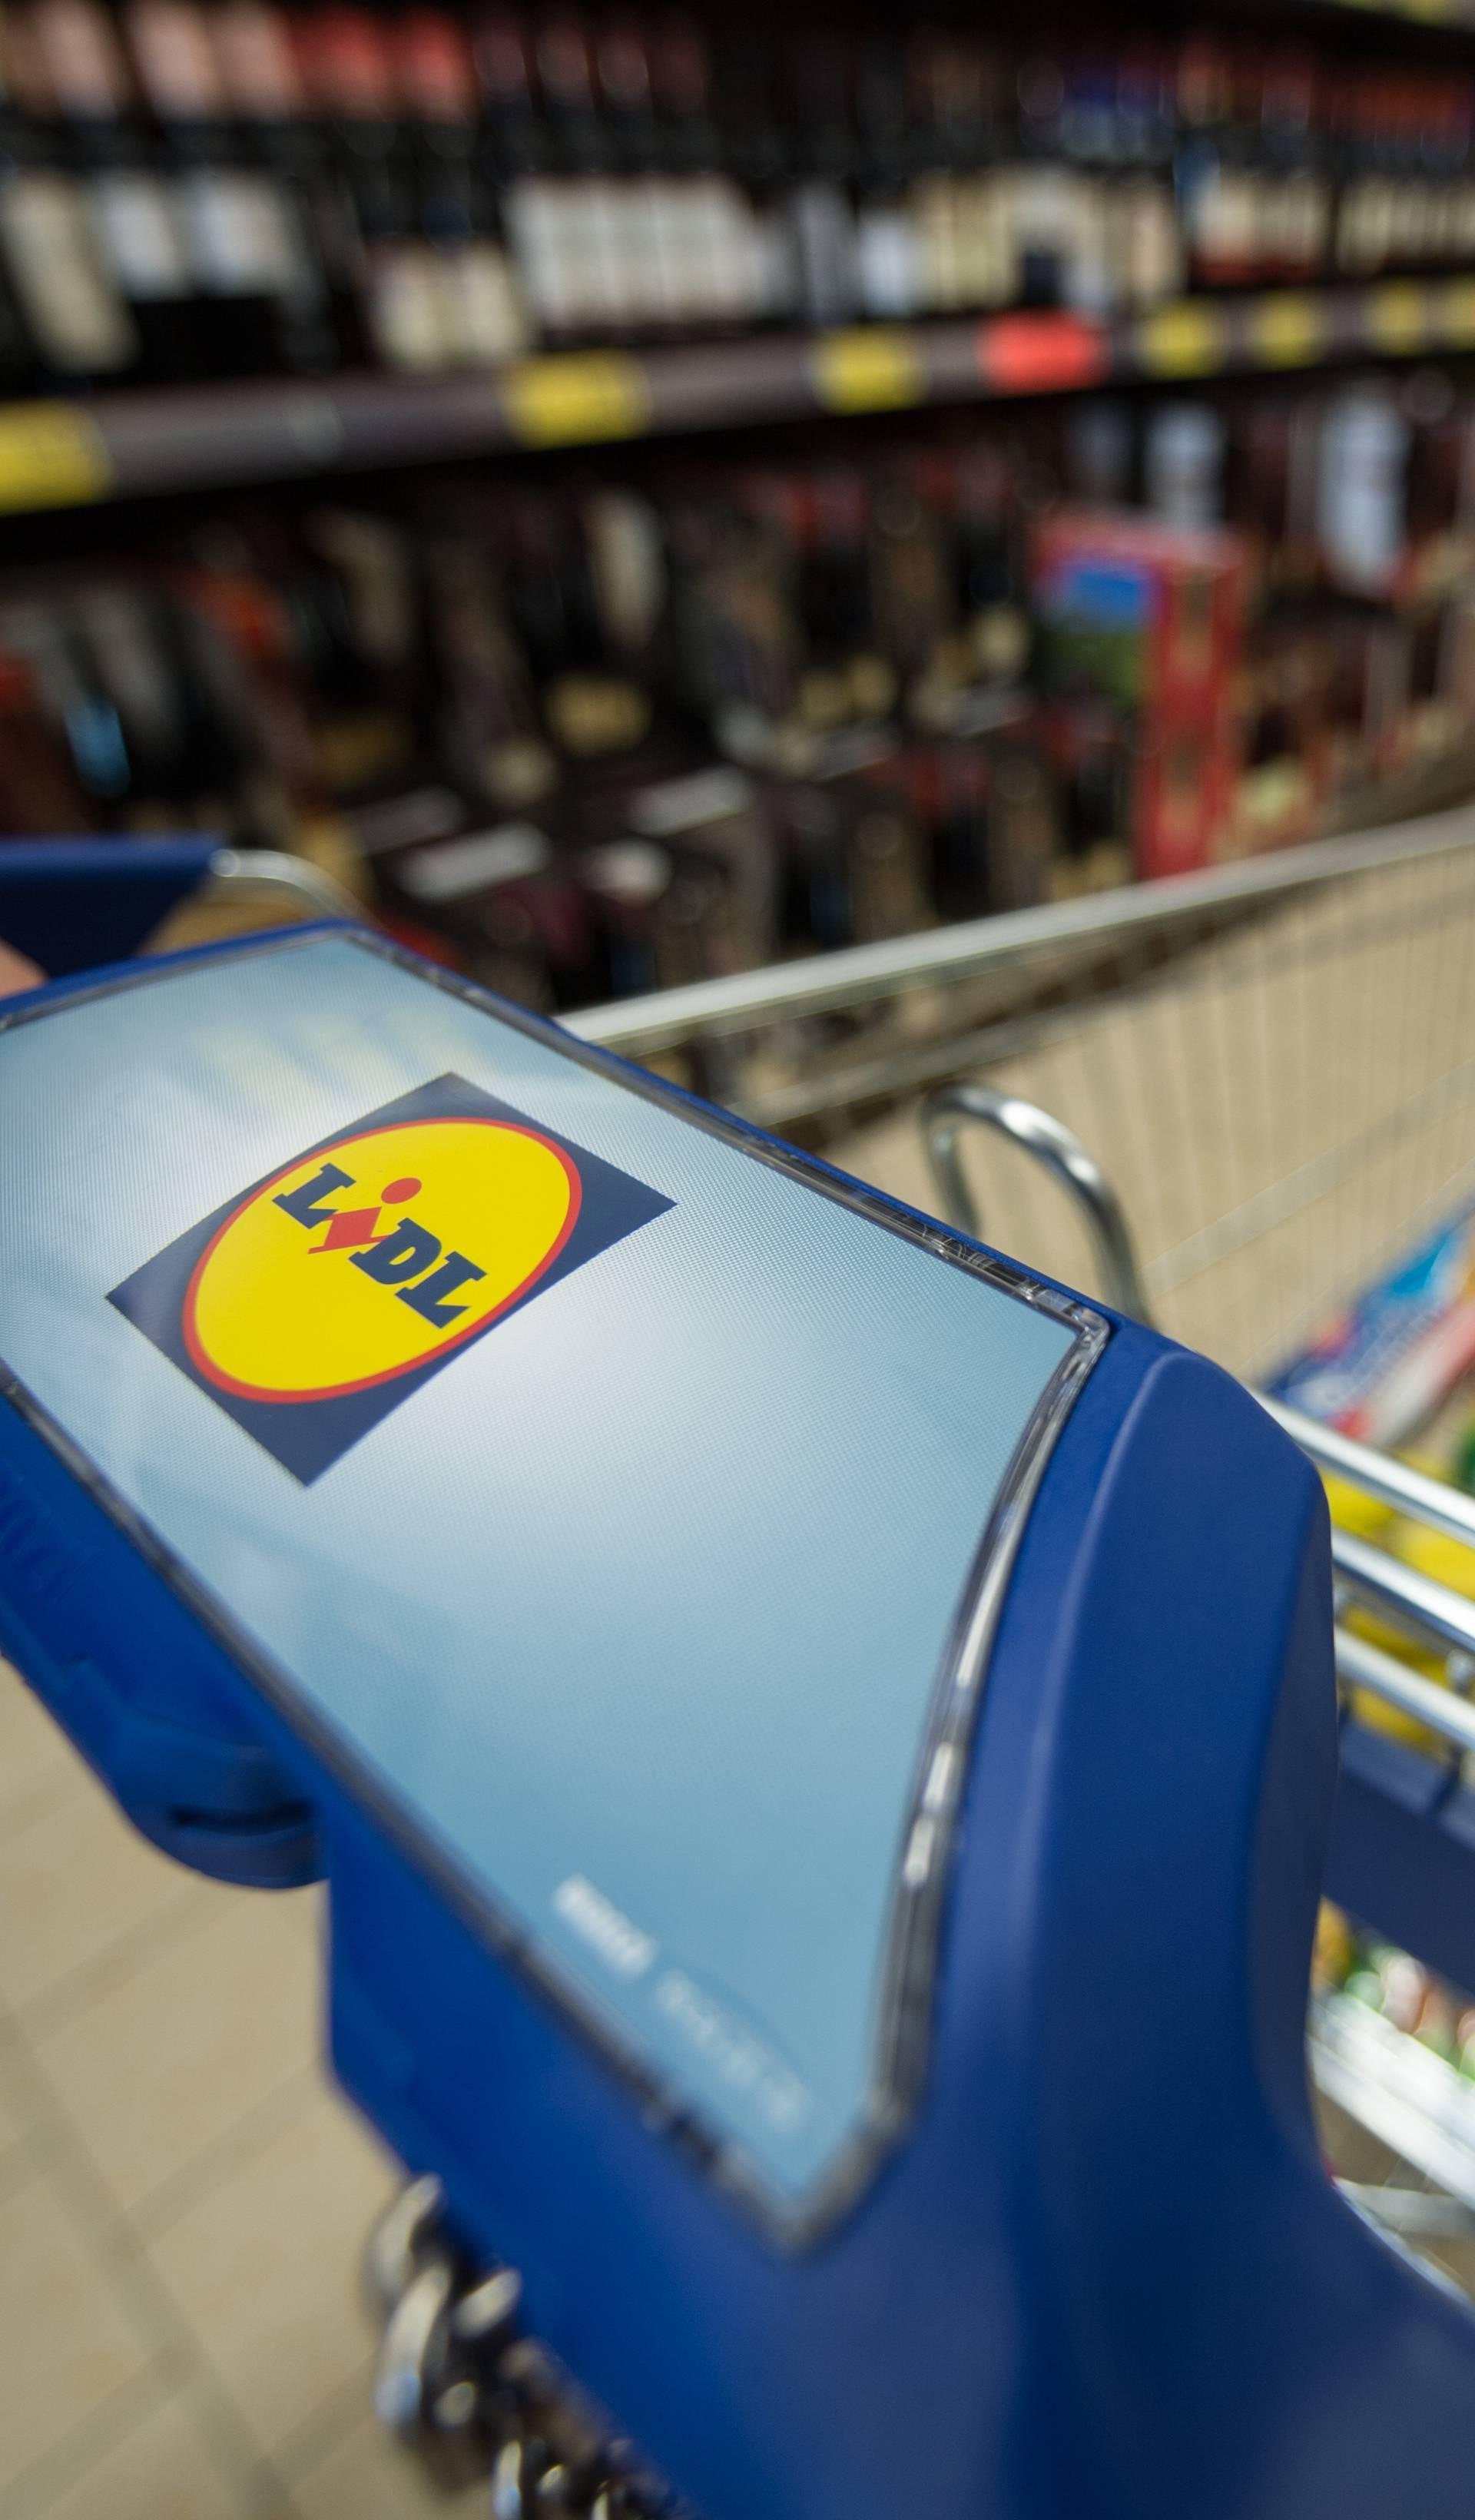 Supermarket discounter Lidl